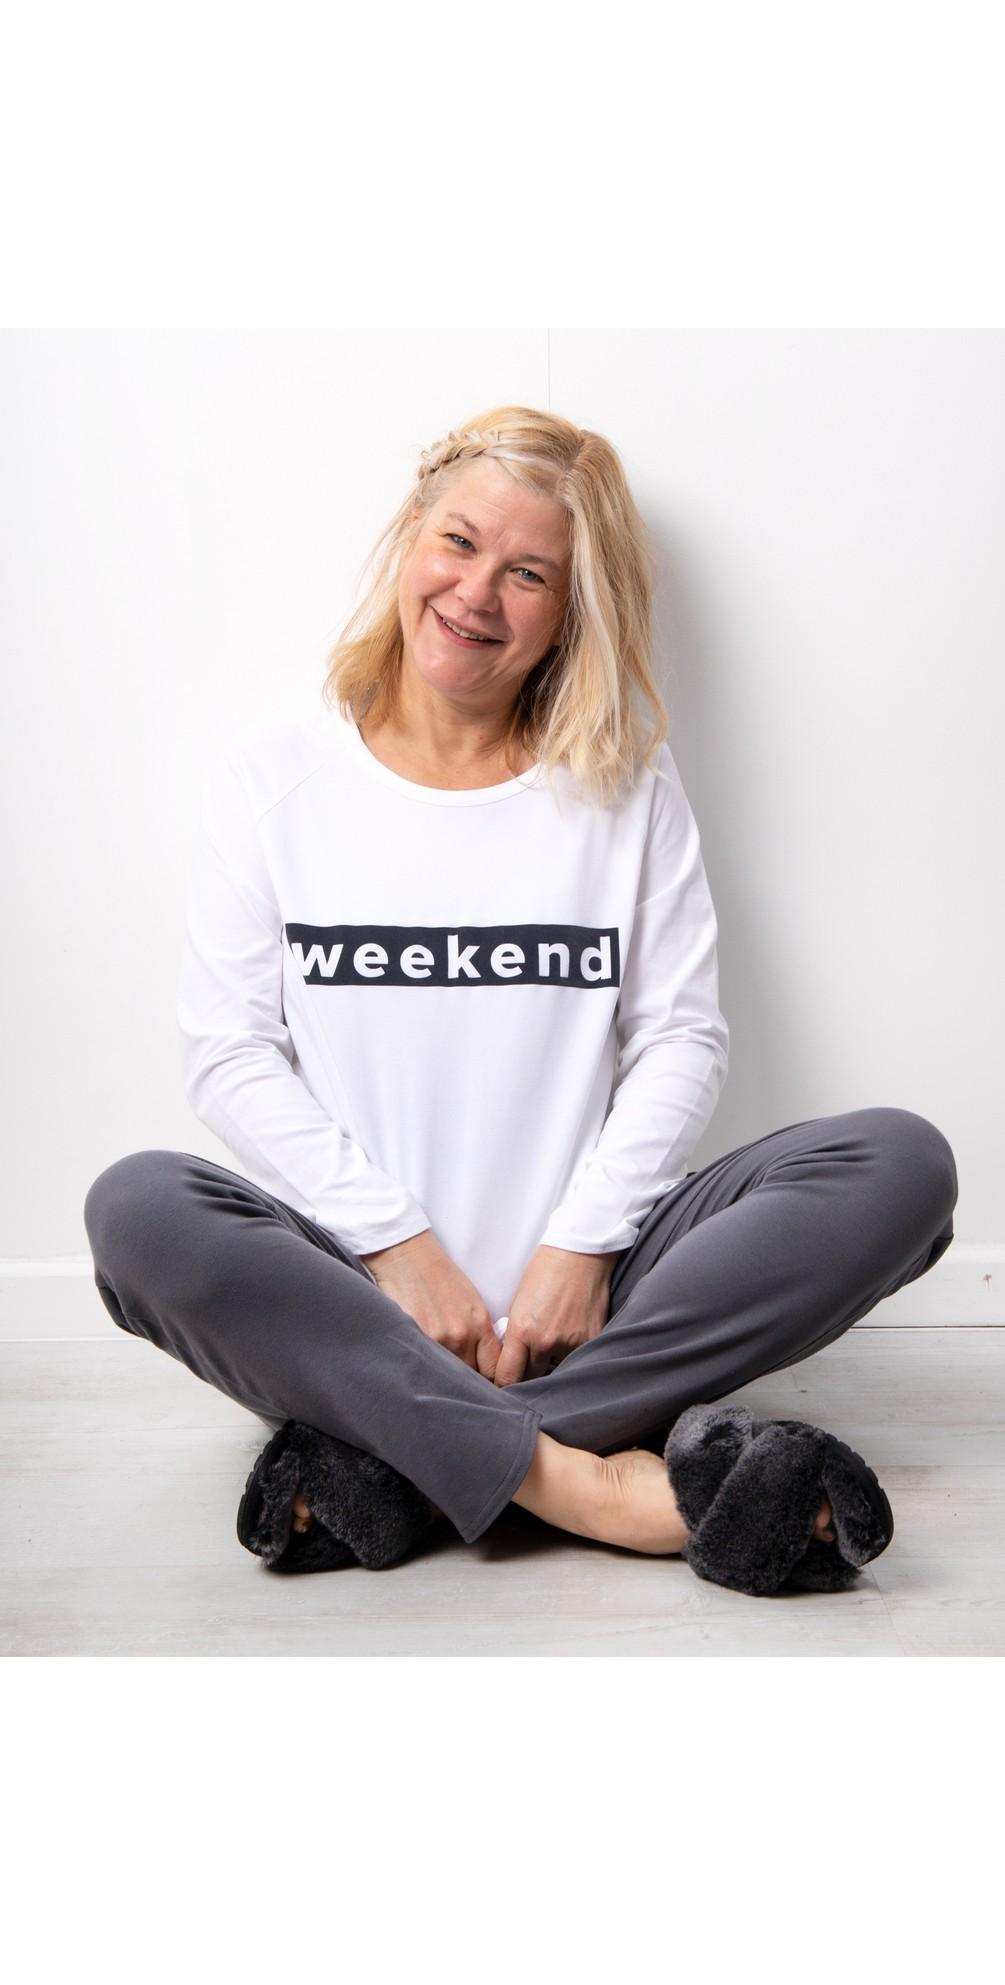 Holly Weekend Top main image